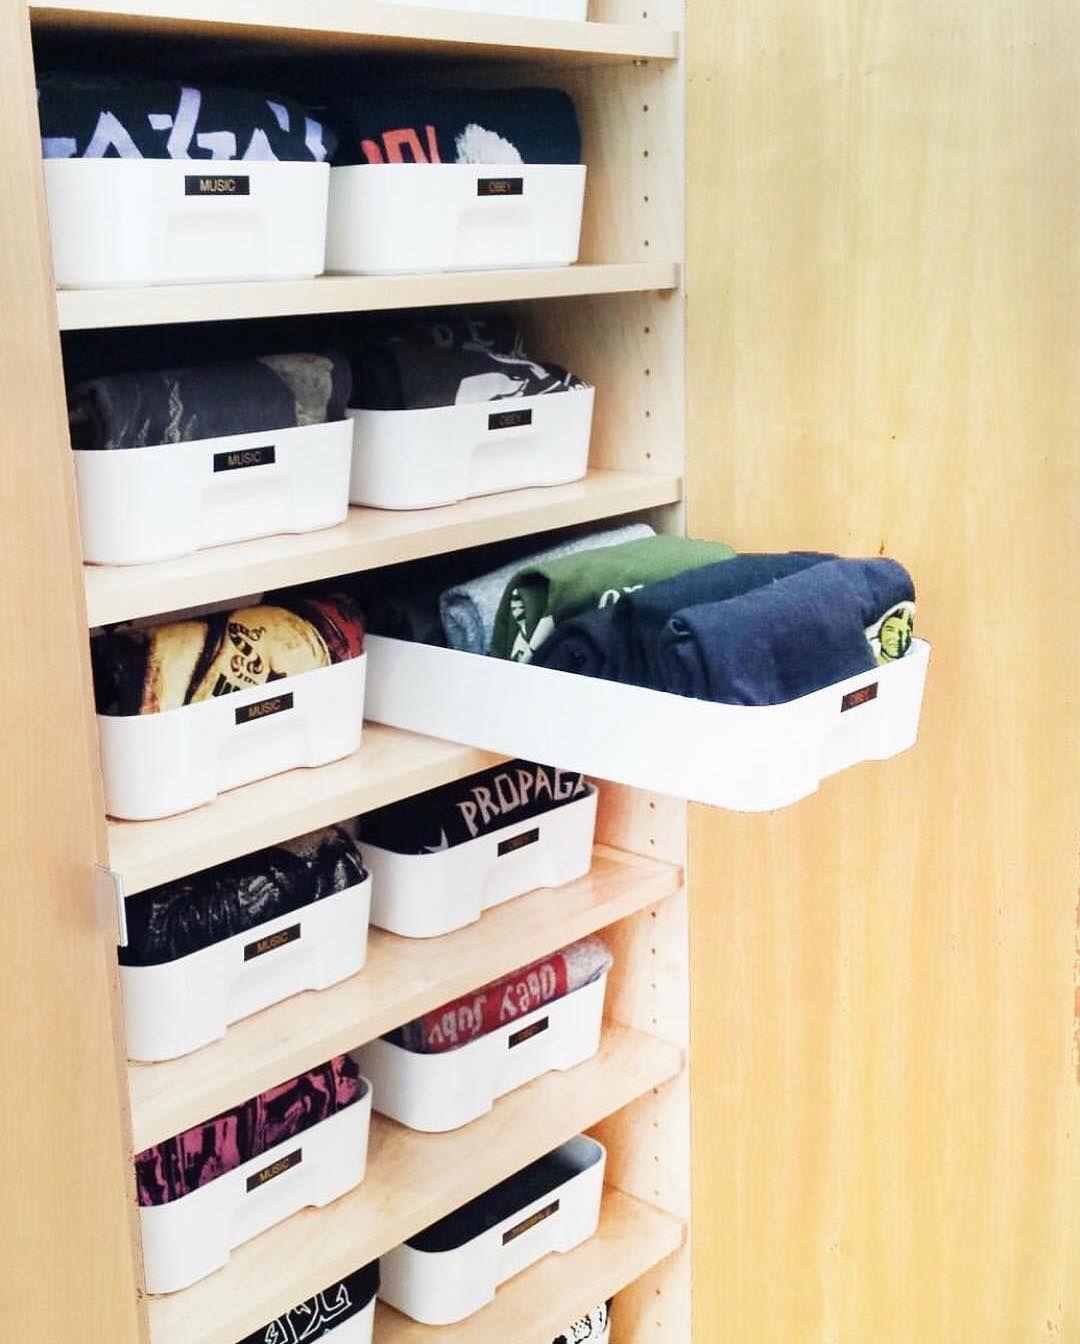 Marie Kondo Trained Konmari On Instagram Day 21 Konmari Clothes Shelves Joywork Closet Clothes Storage Ikea Storage Storage Closet Organization